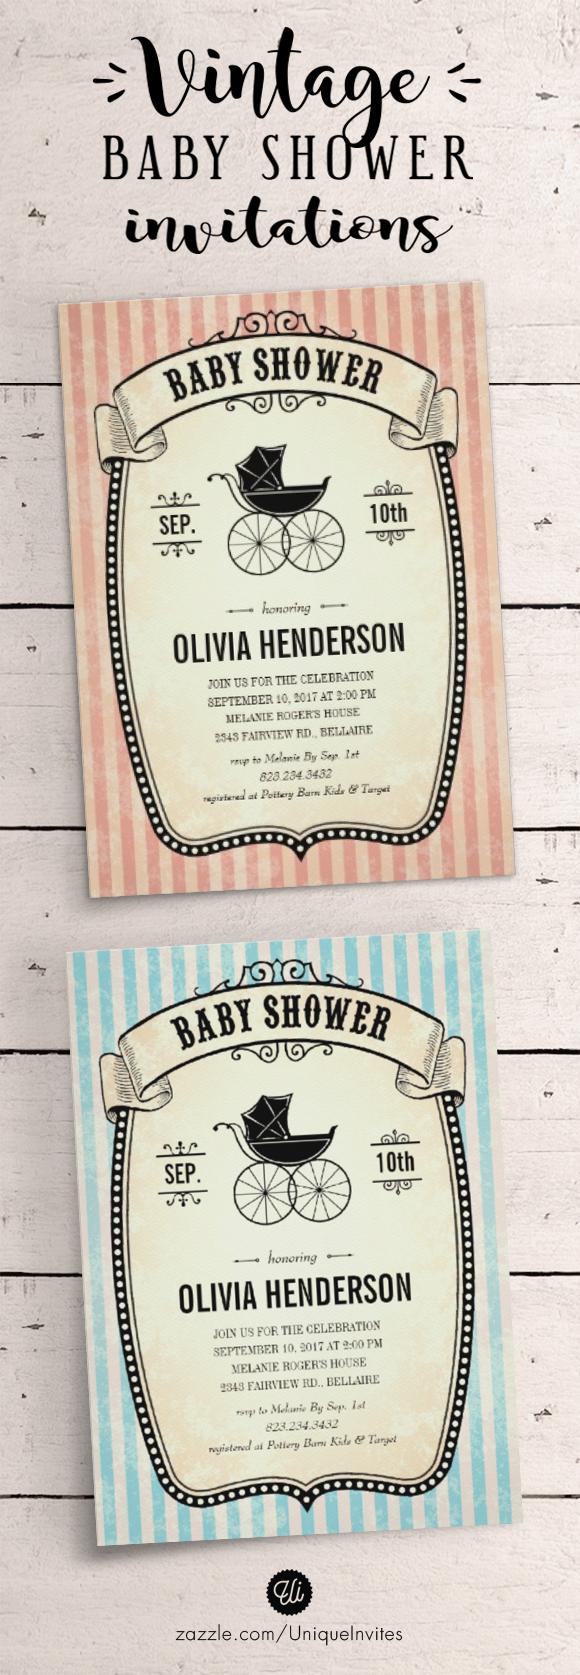 Victorian vintage baby shower invitations baby shower invitations victorian vintage baby shower invitations filmwisefo